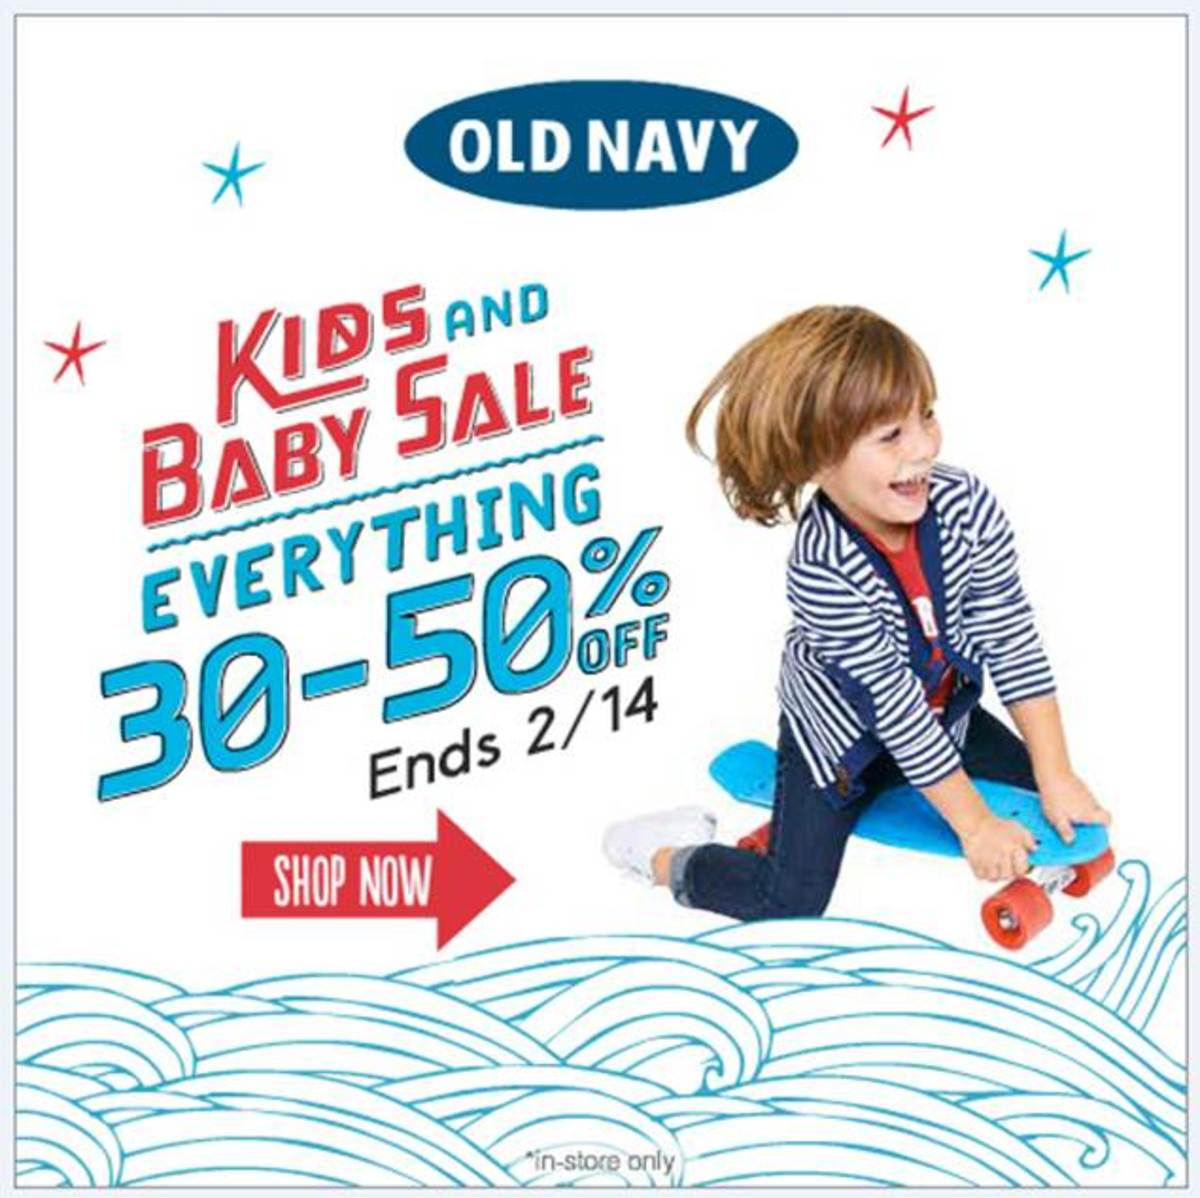 Old Navy Kids & Baby Sale